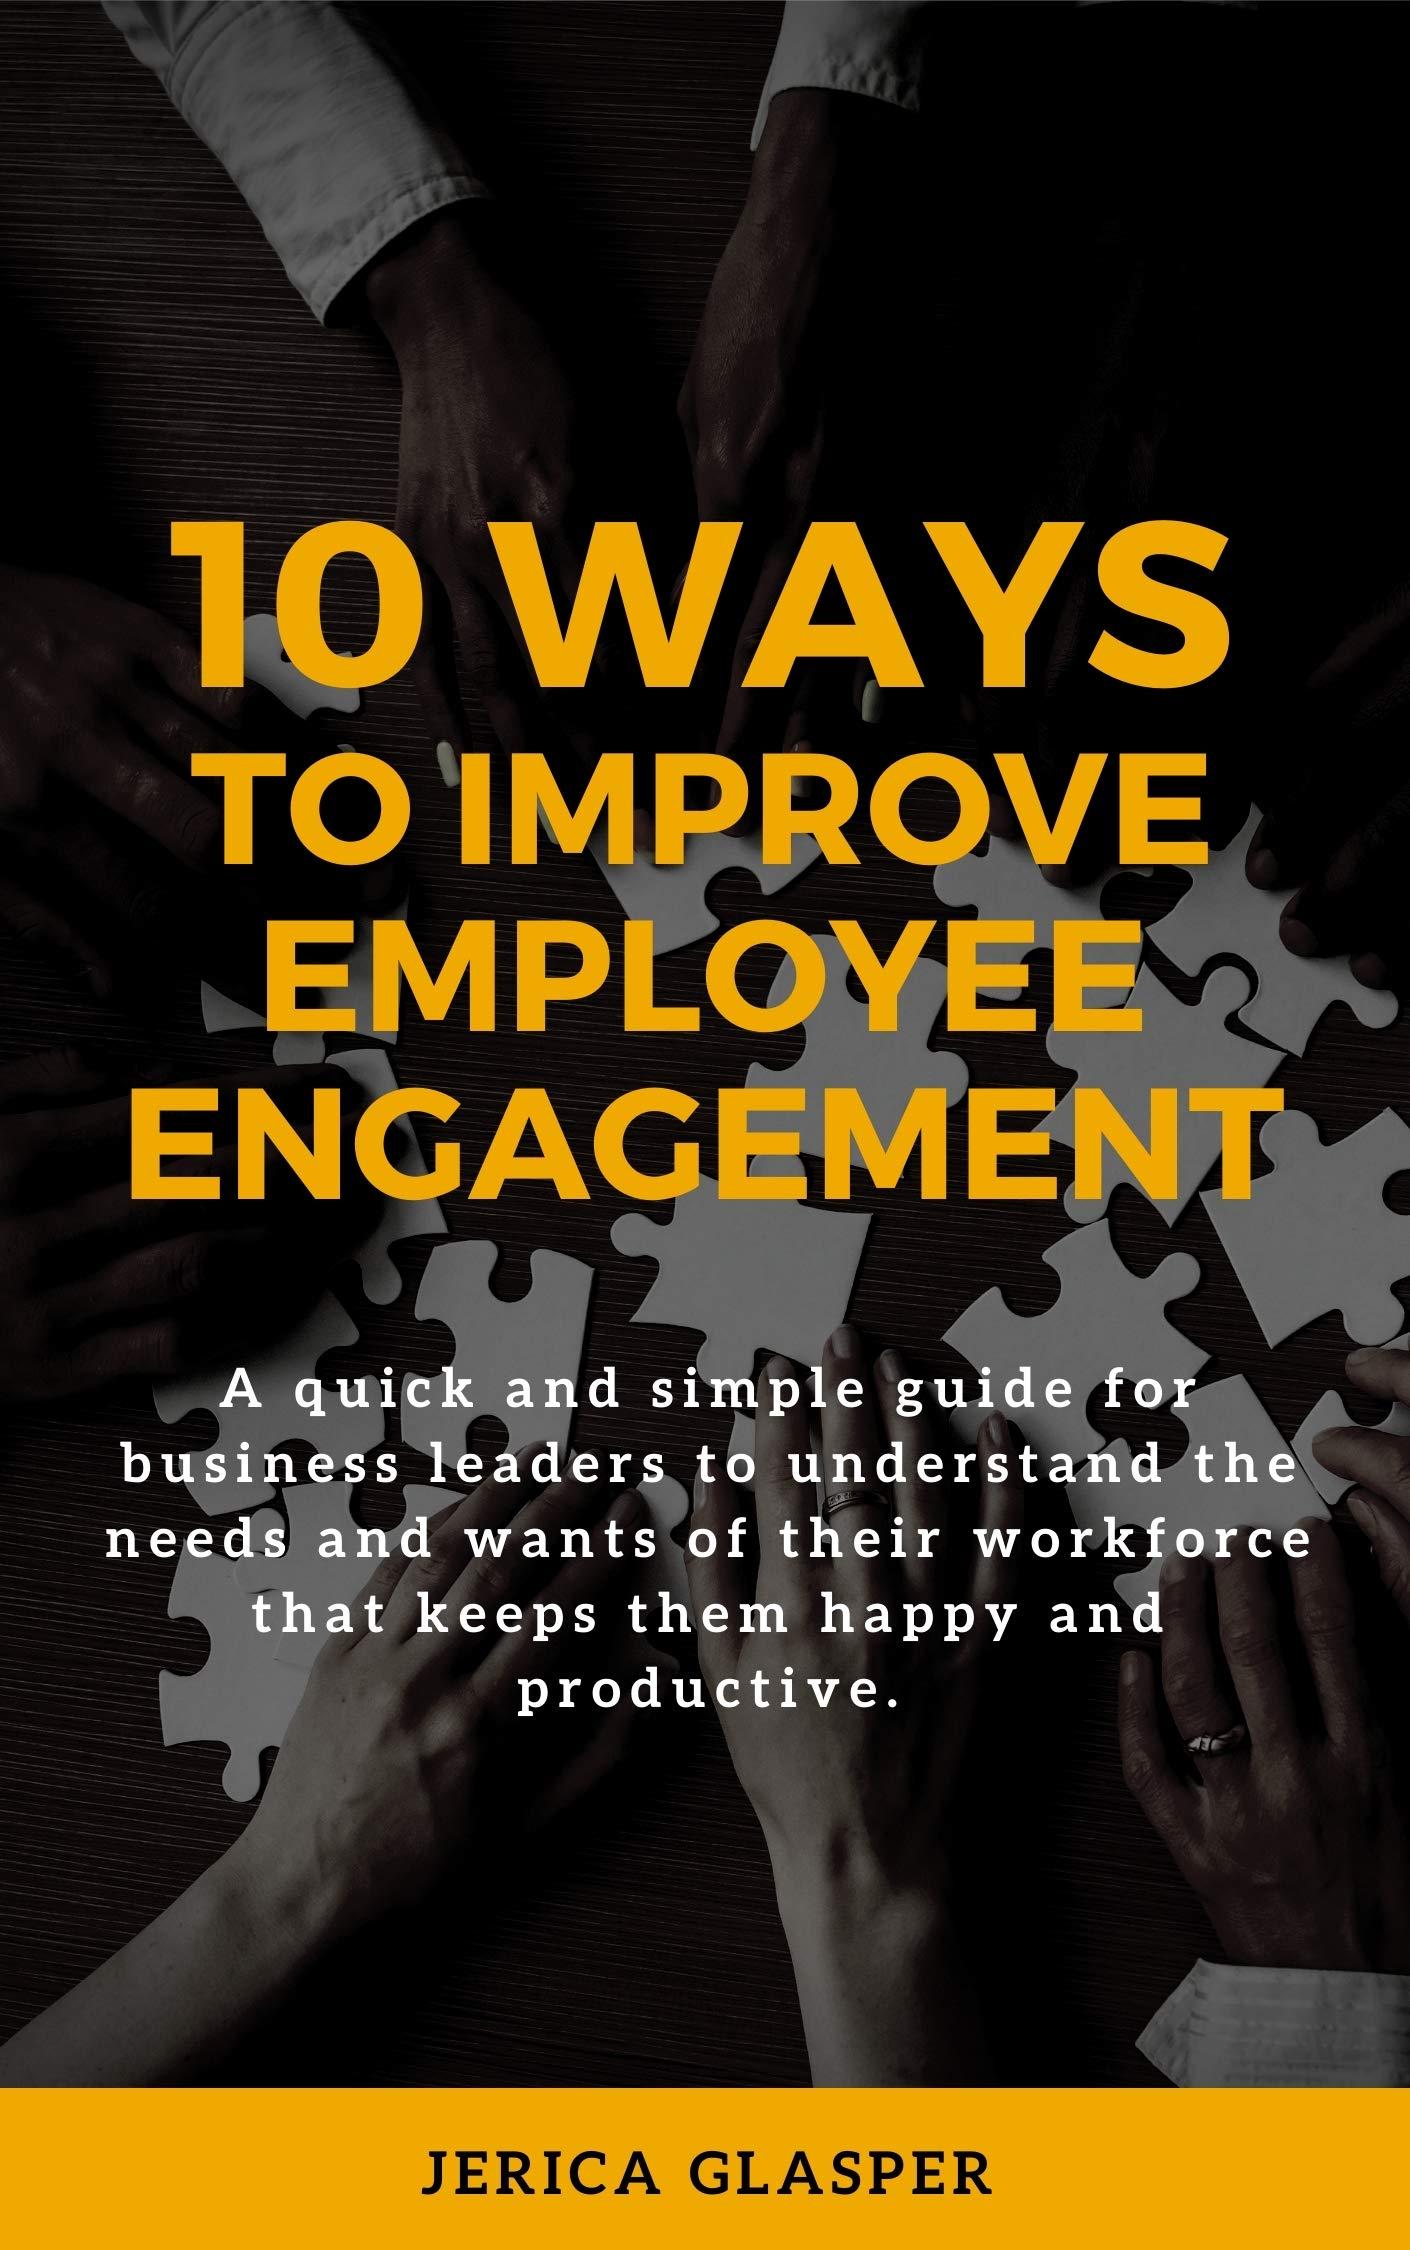 10 Ways To Improve Employee Engagement